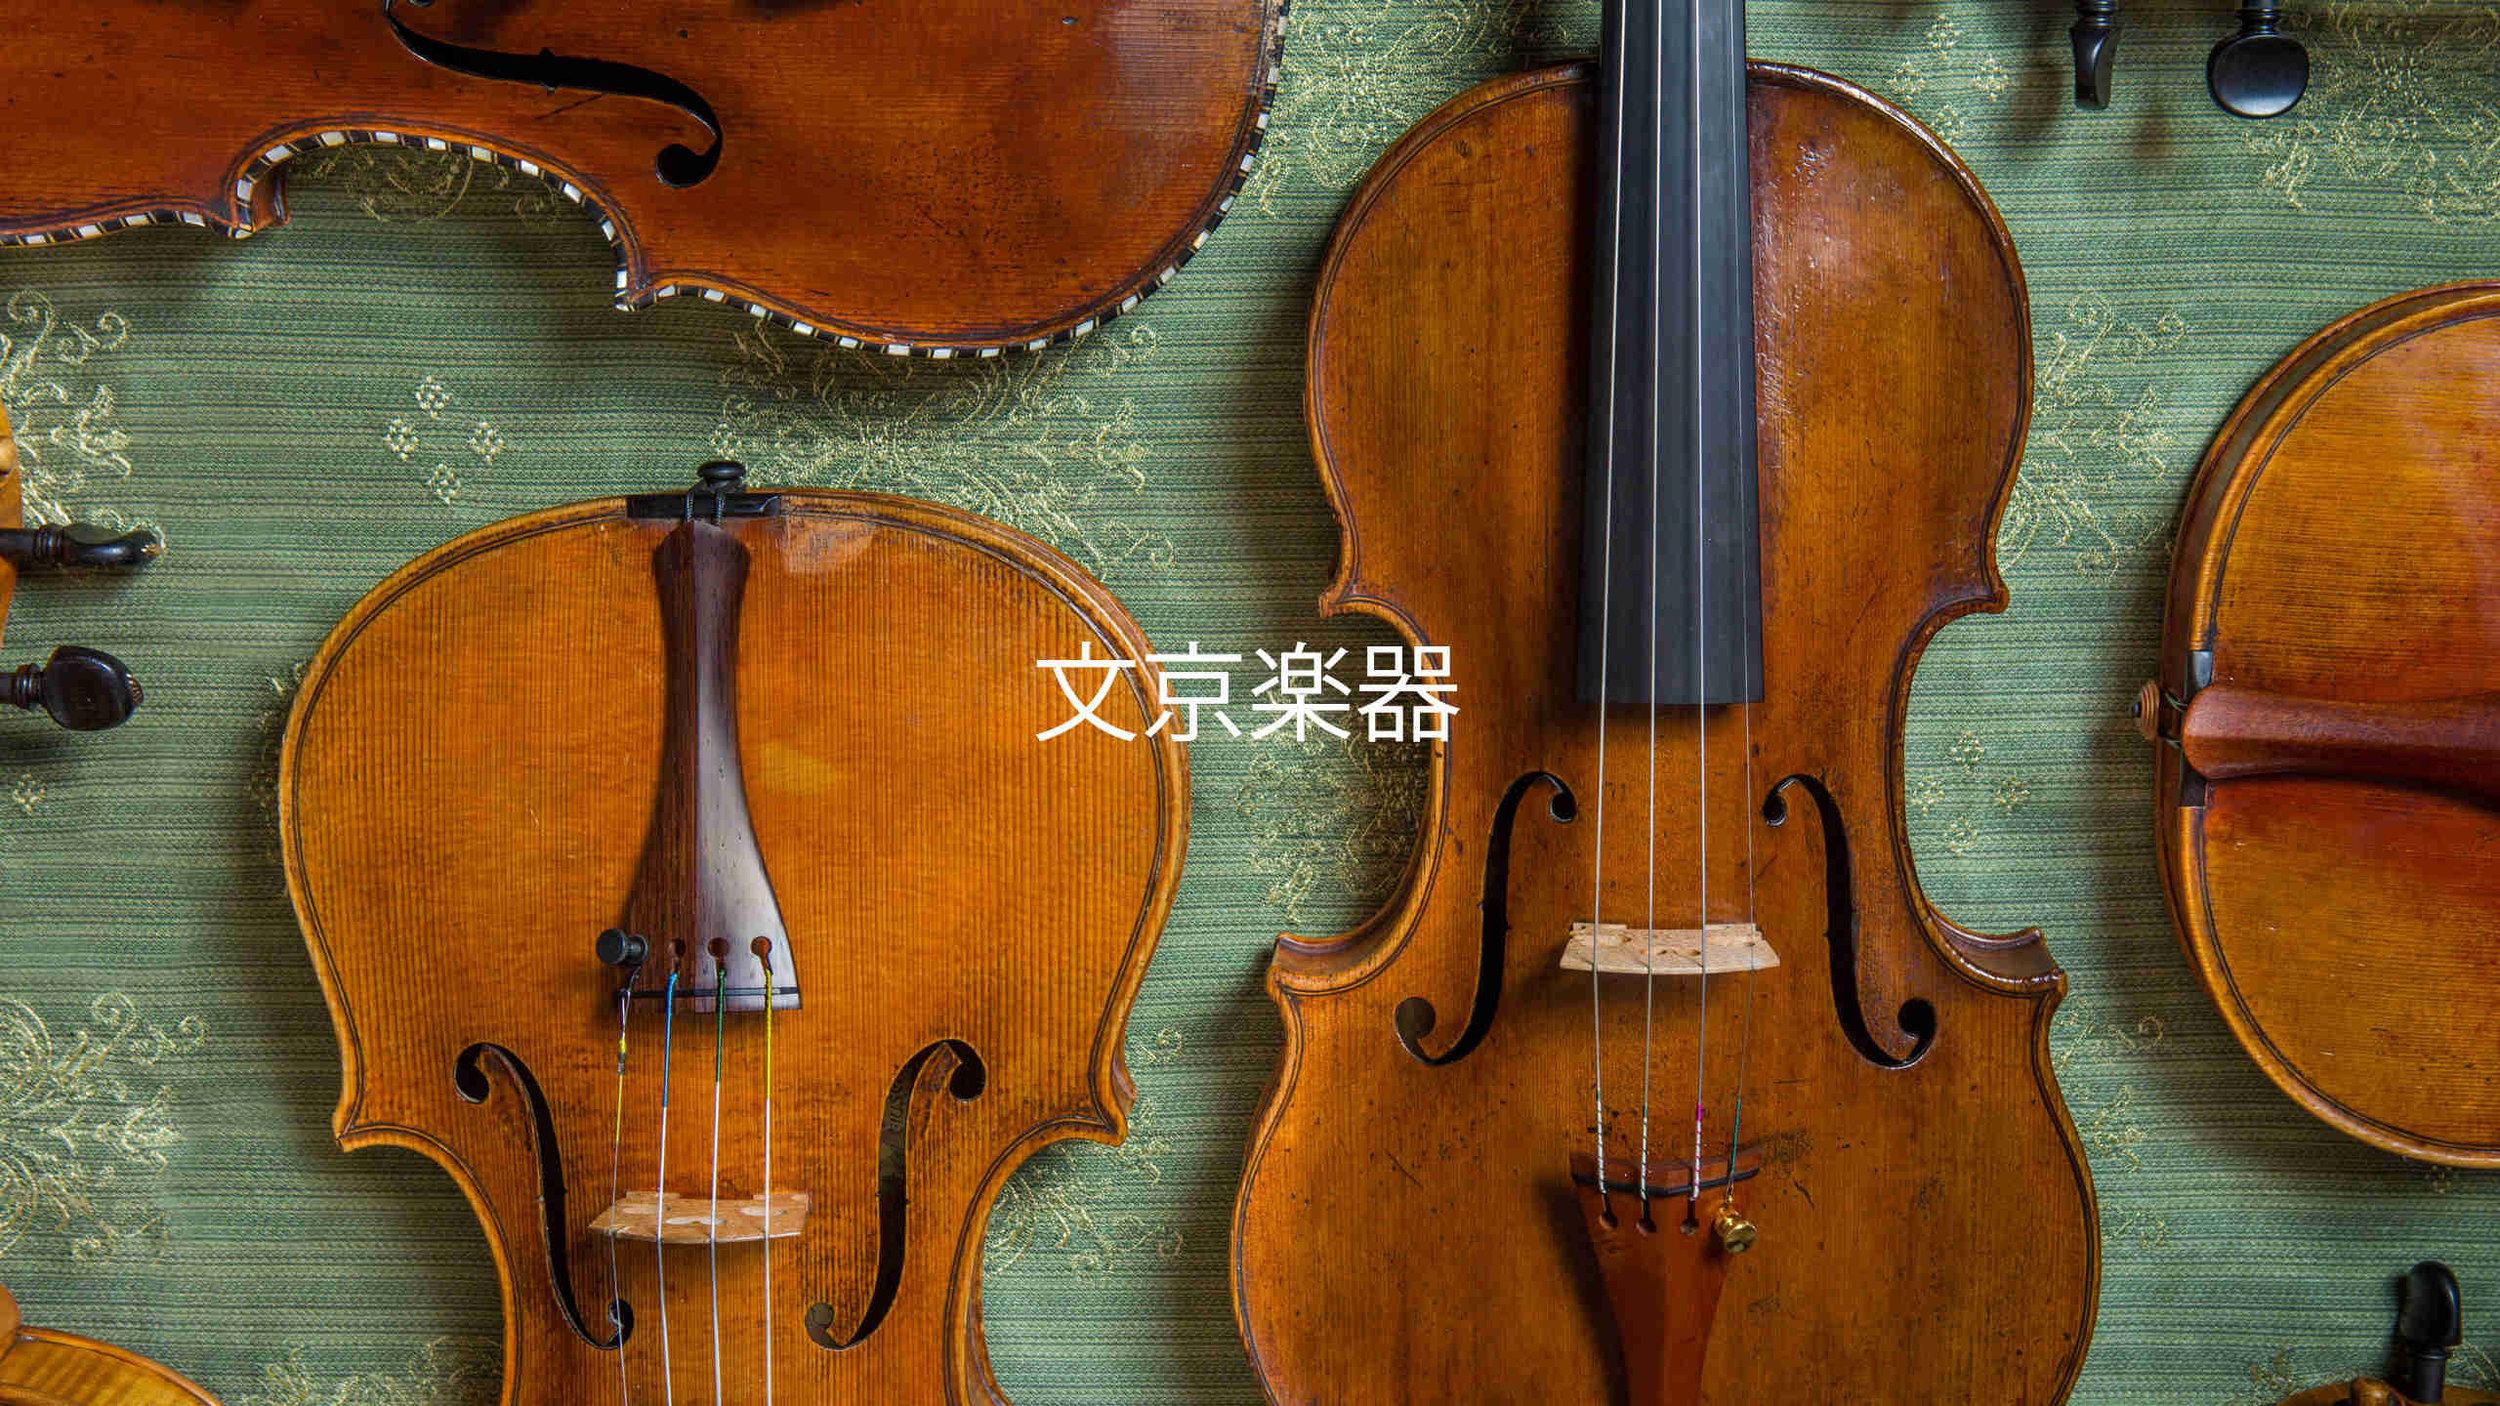 violin_7_bunkyo_7.jpg